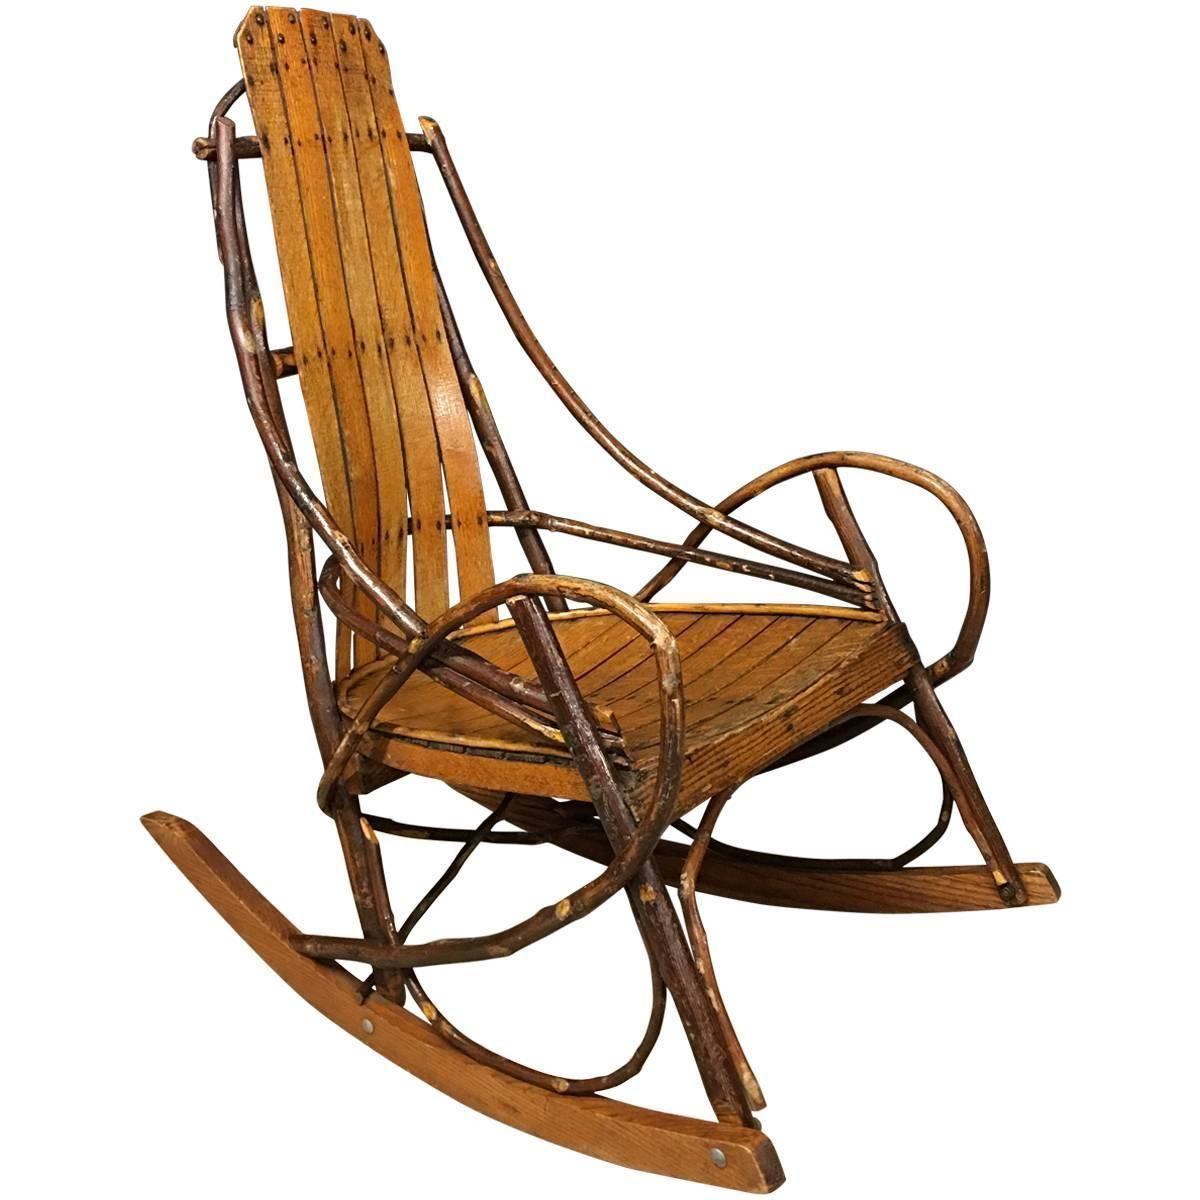 Vintage American Adirondack Rocking Chair 1920s Vintage Rocking